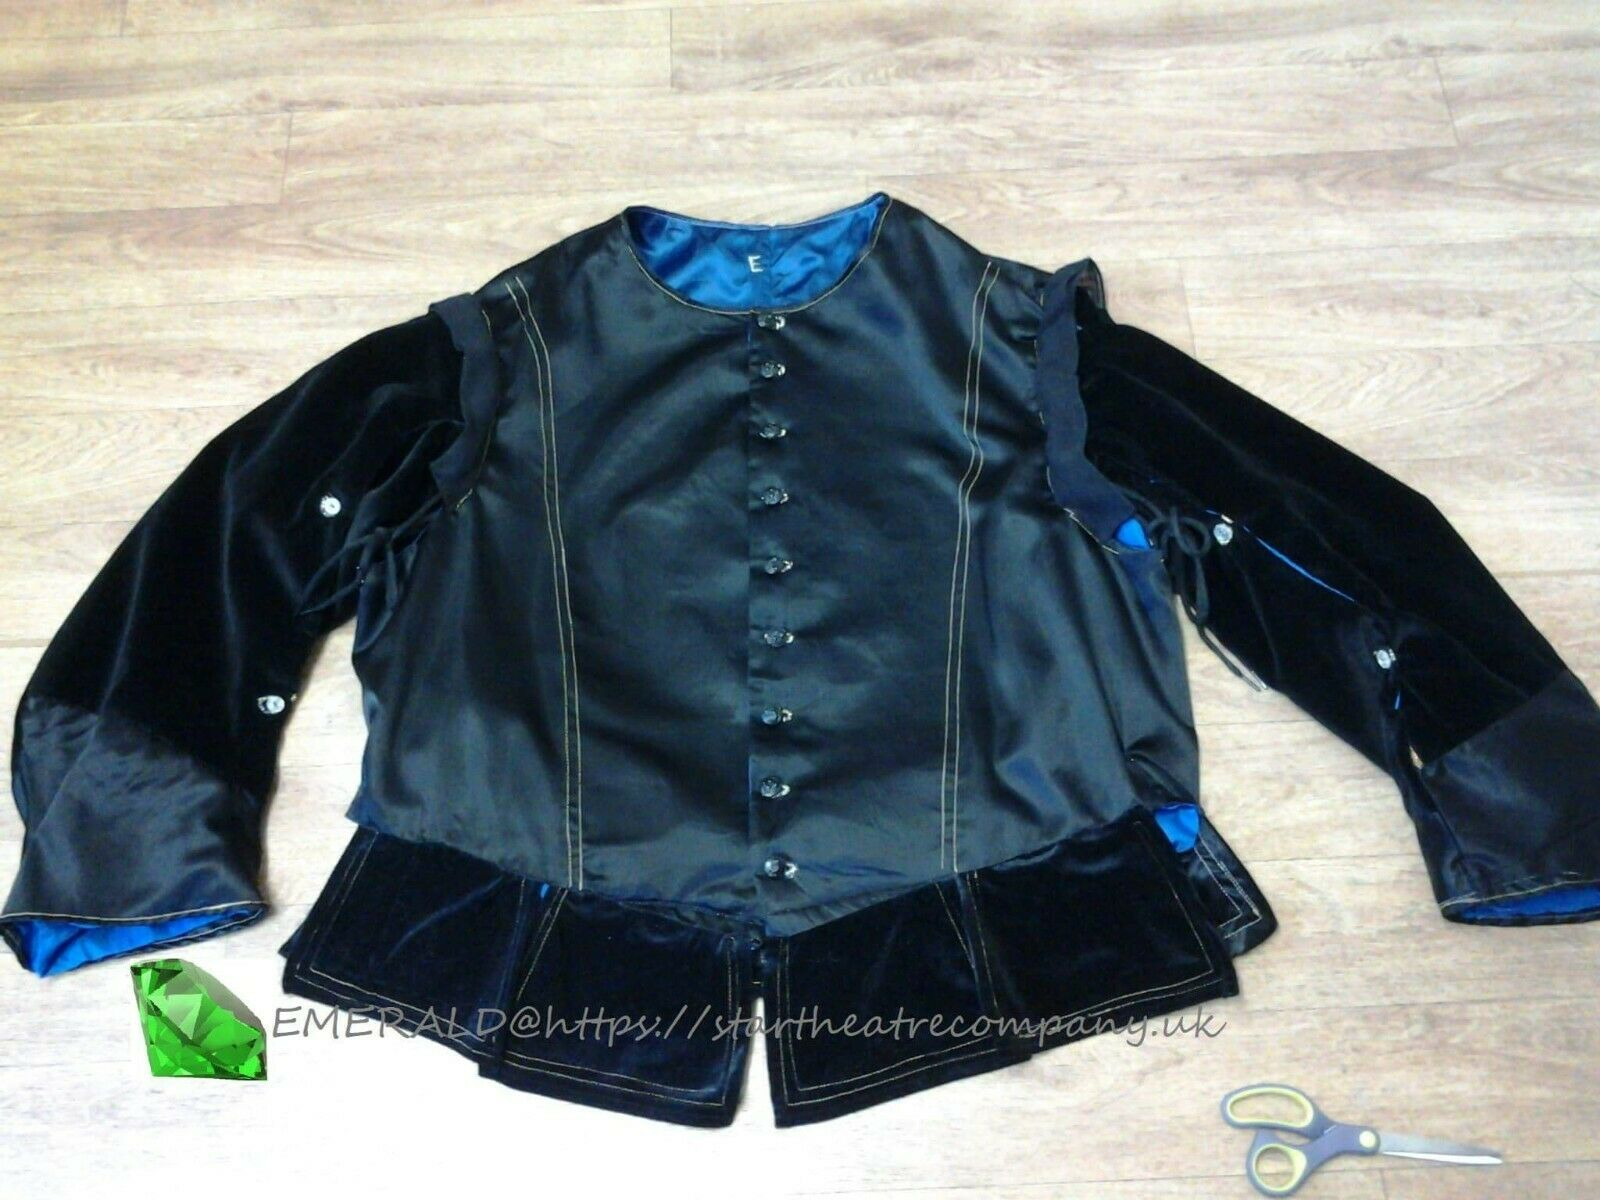 handmade velvet doublet renaissance ; tudor outfit ; adjustable